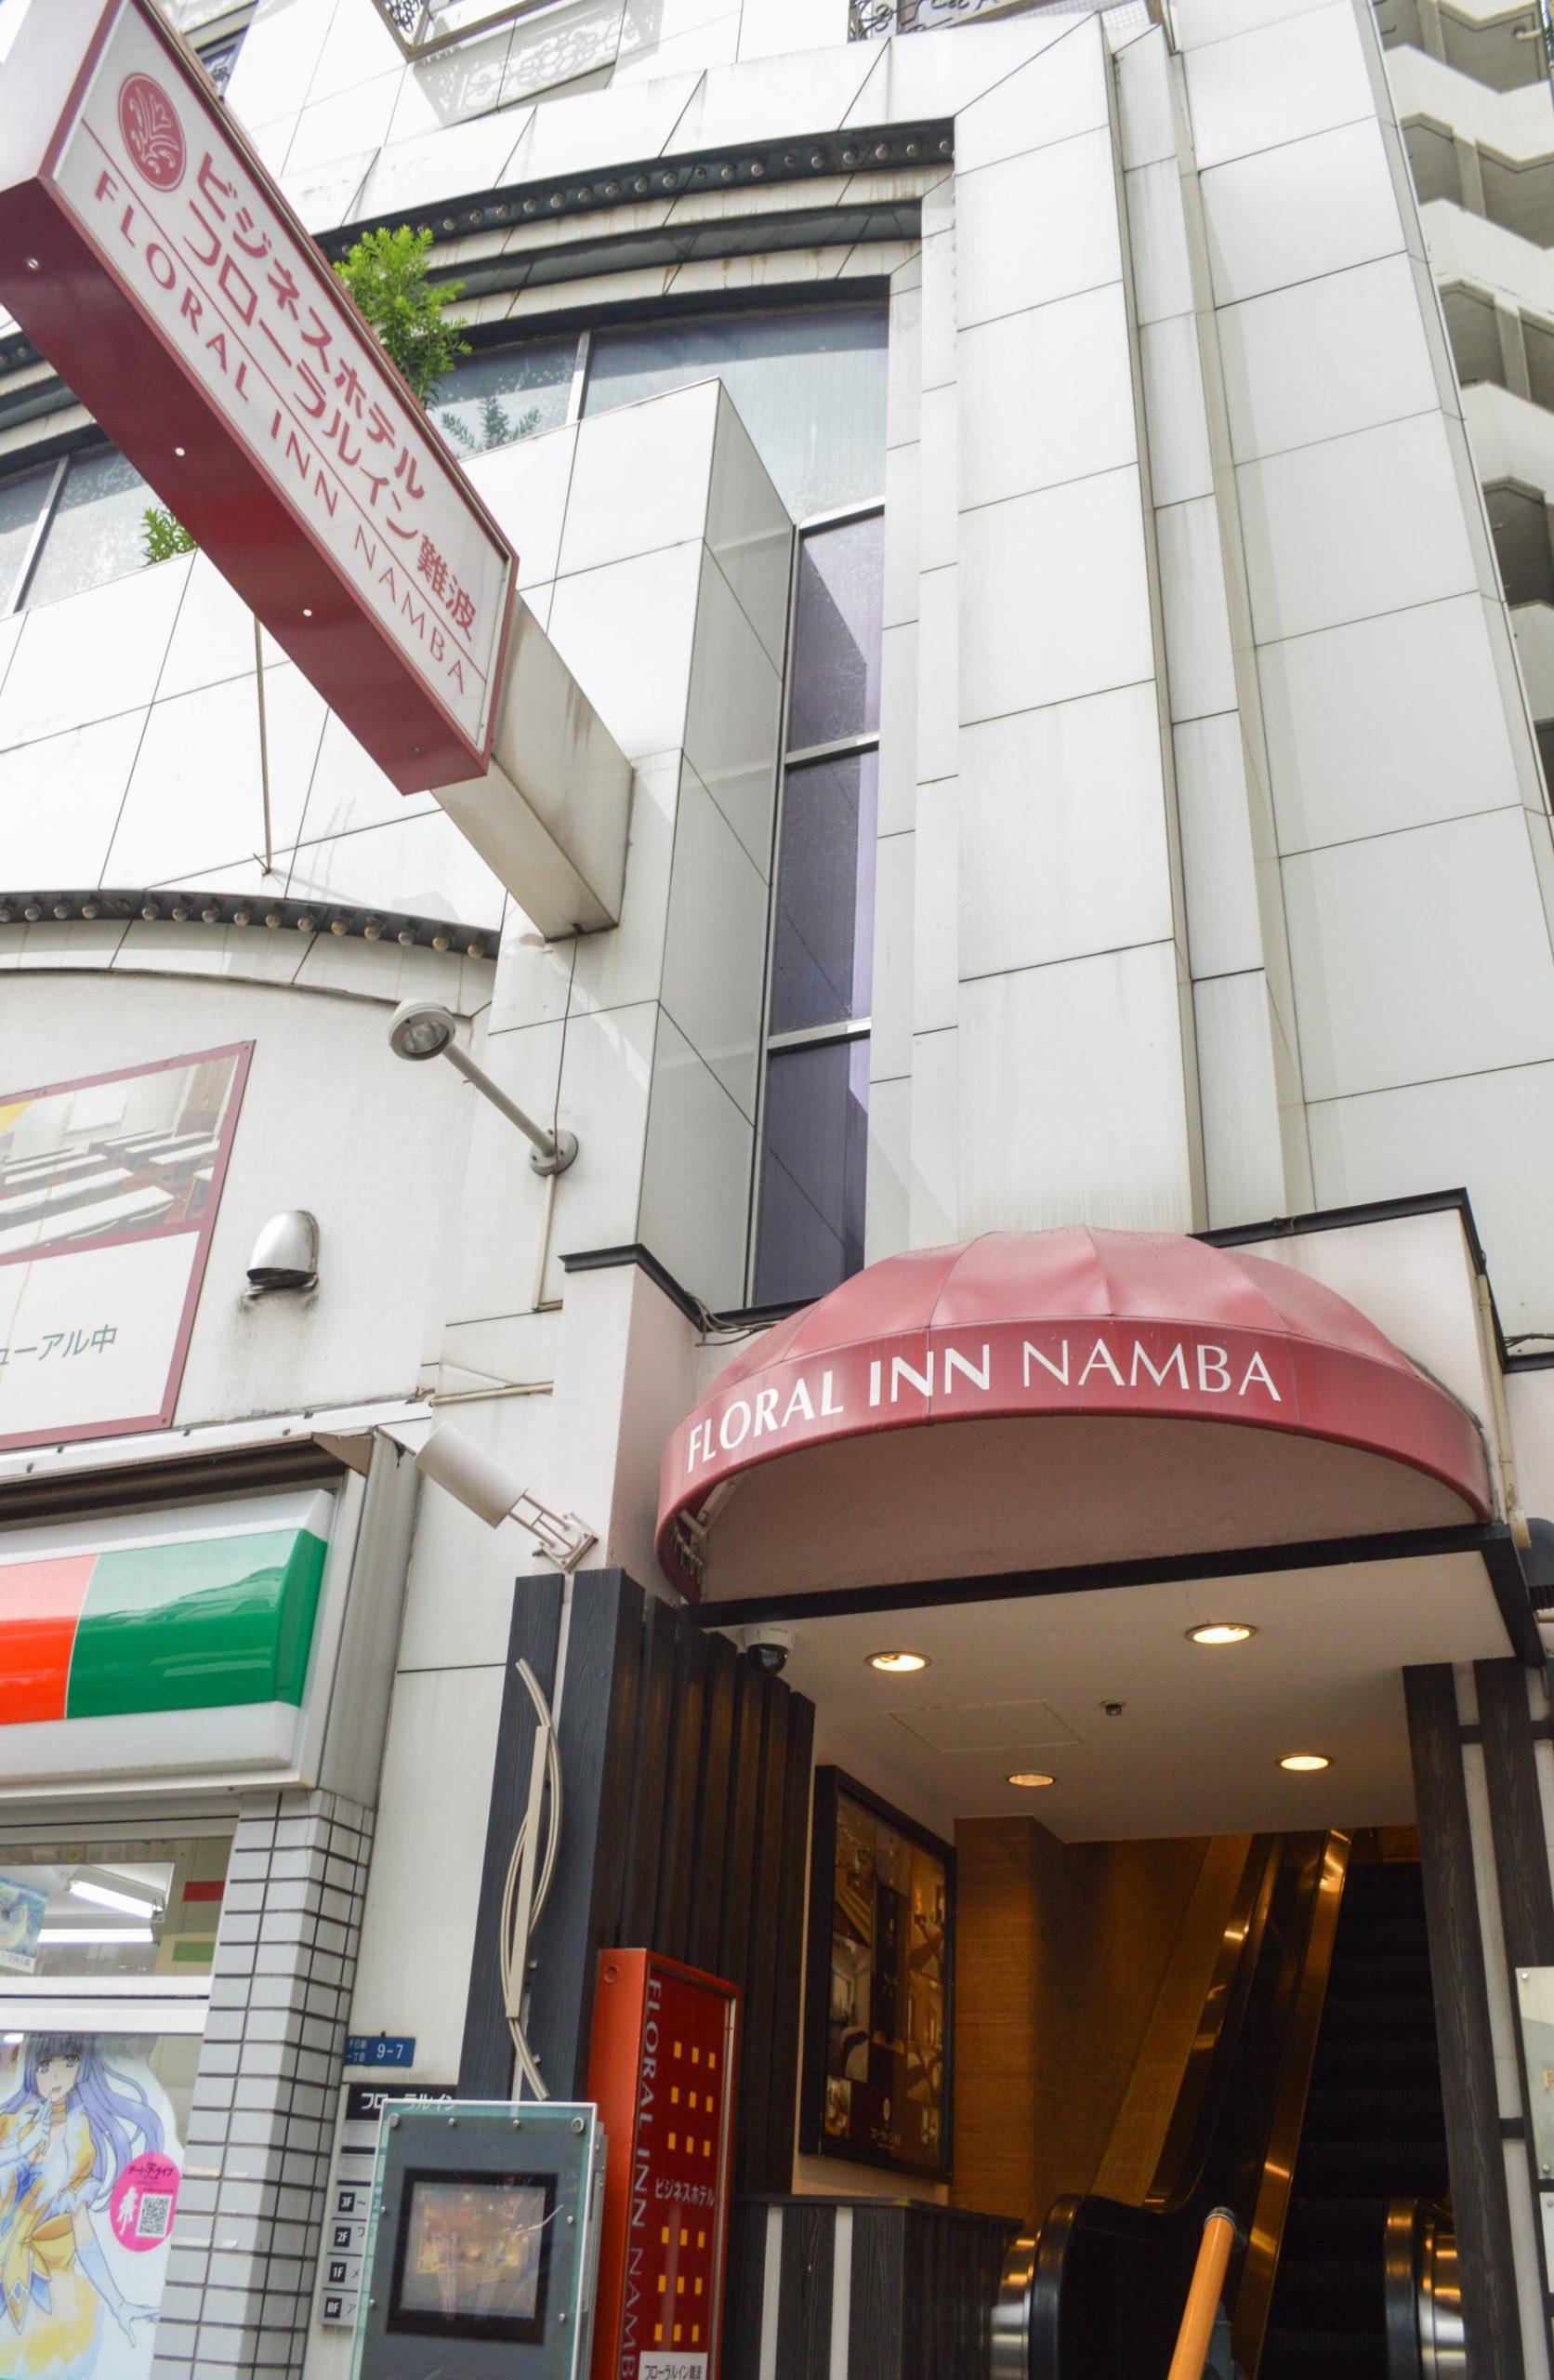 Osaka Floral Inn Namba